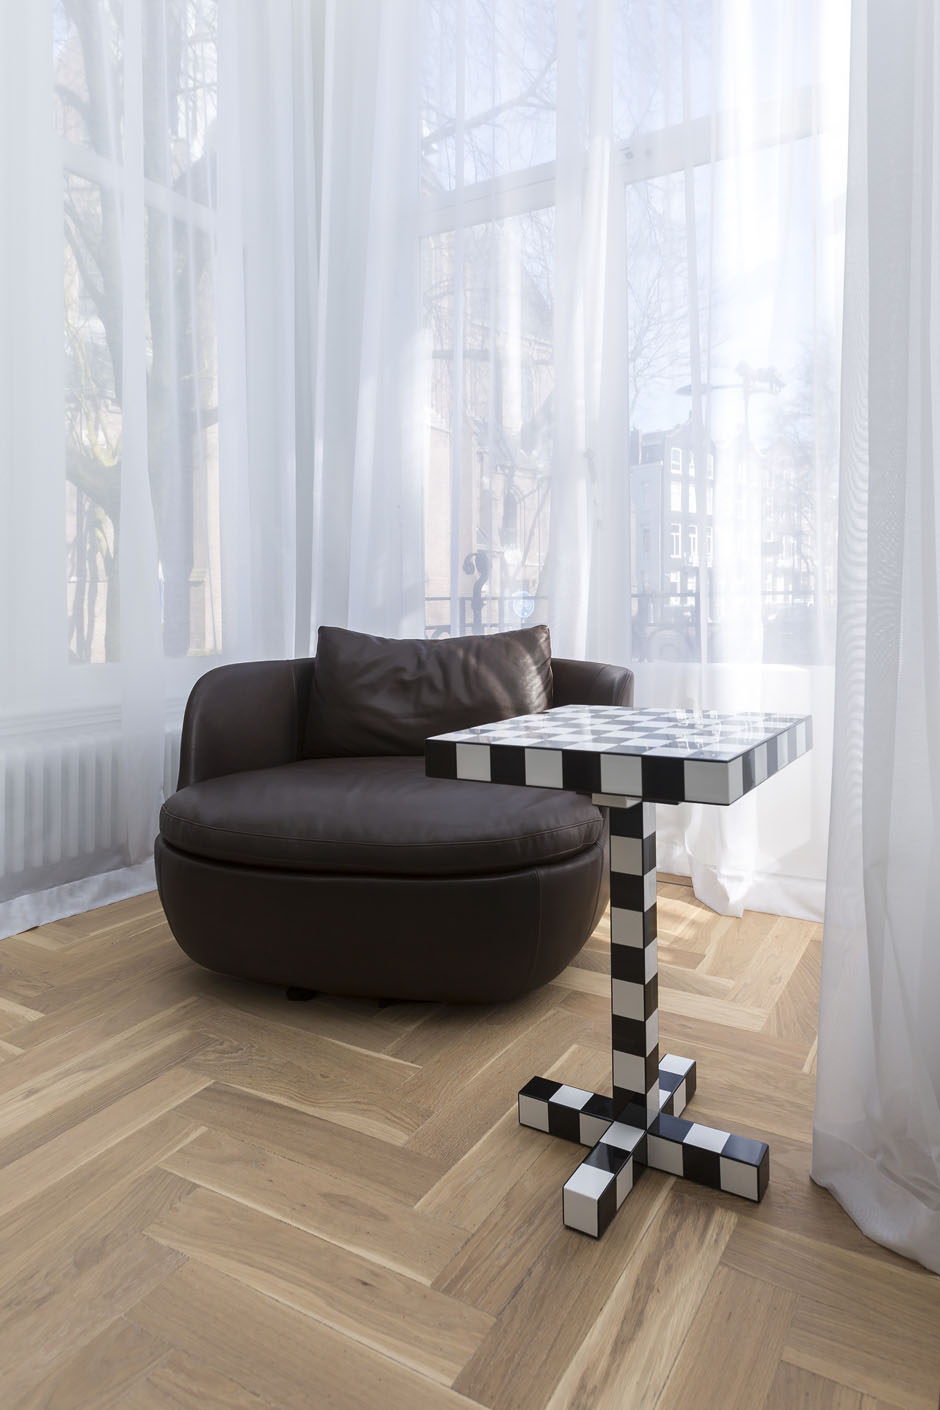 studio-hermanides-boutique-office-6.jpg